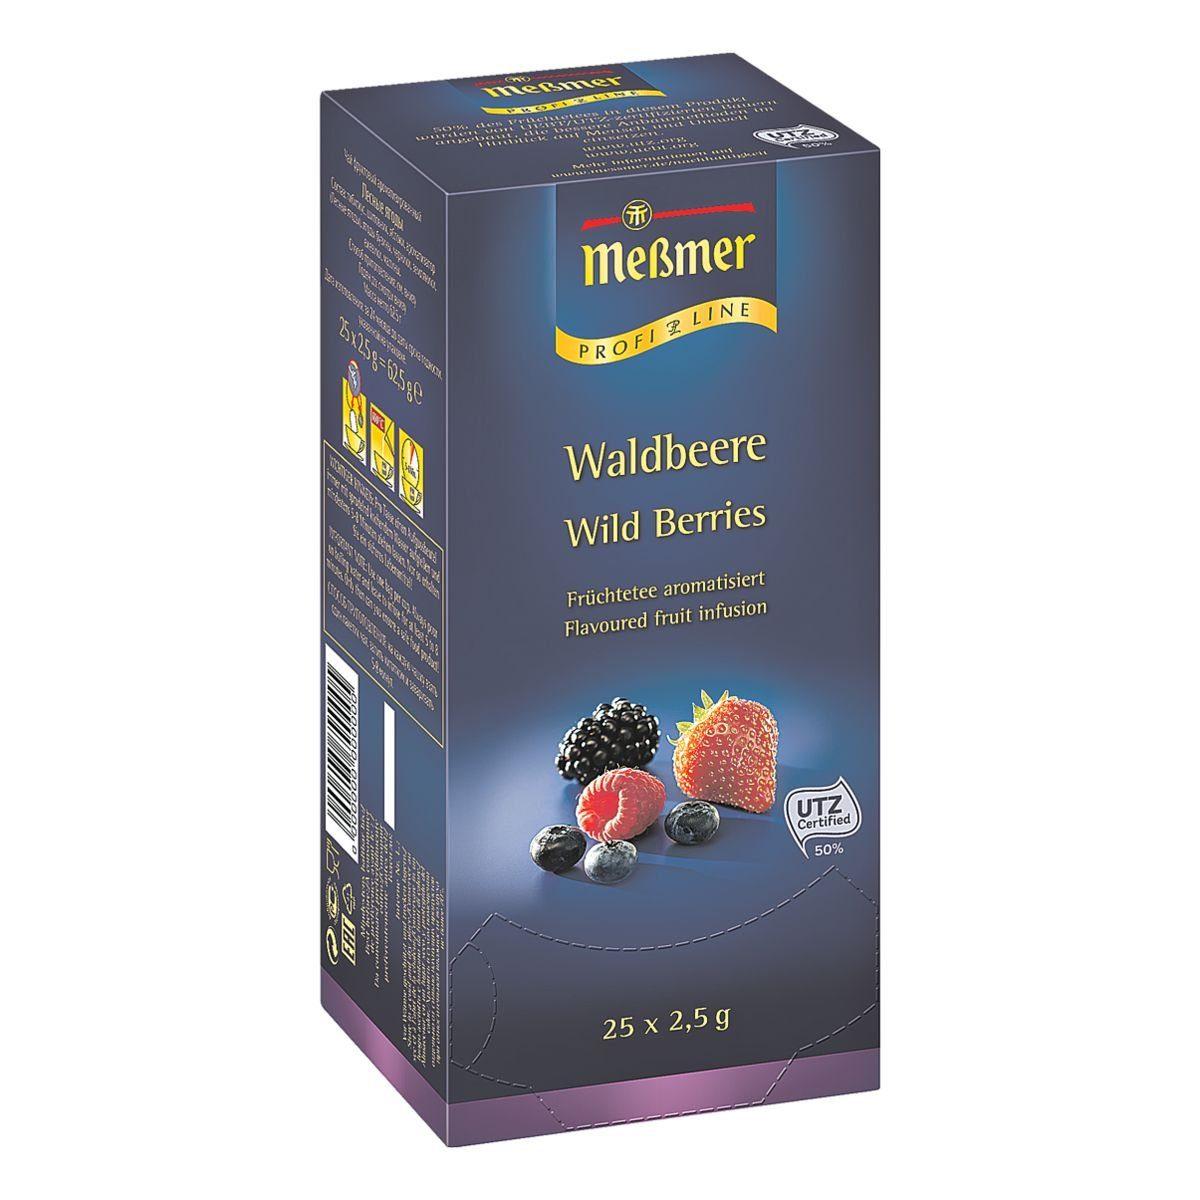 Meßmer Tee »Profi Line Waldbeere«